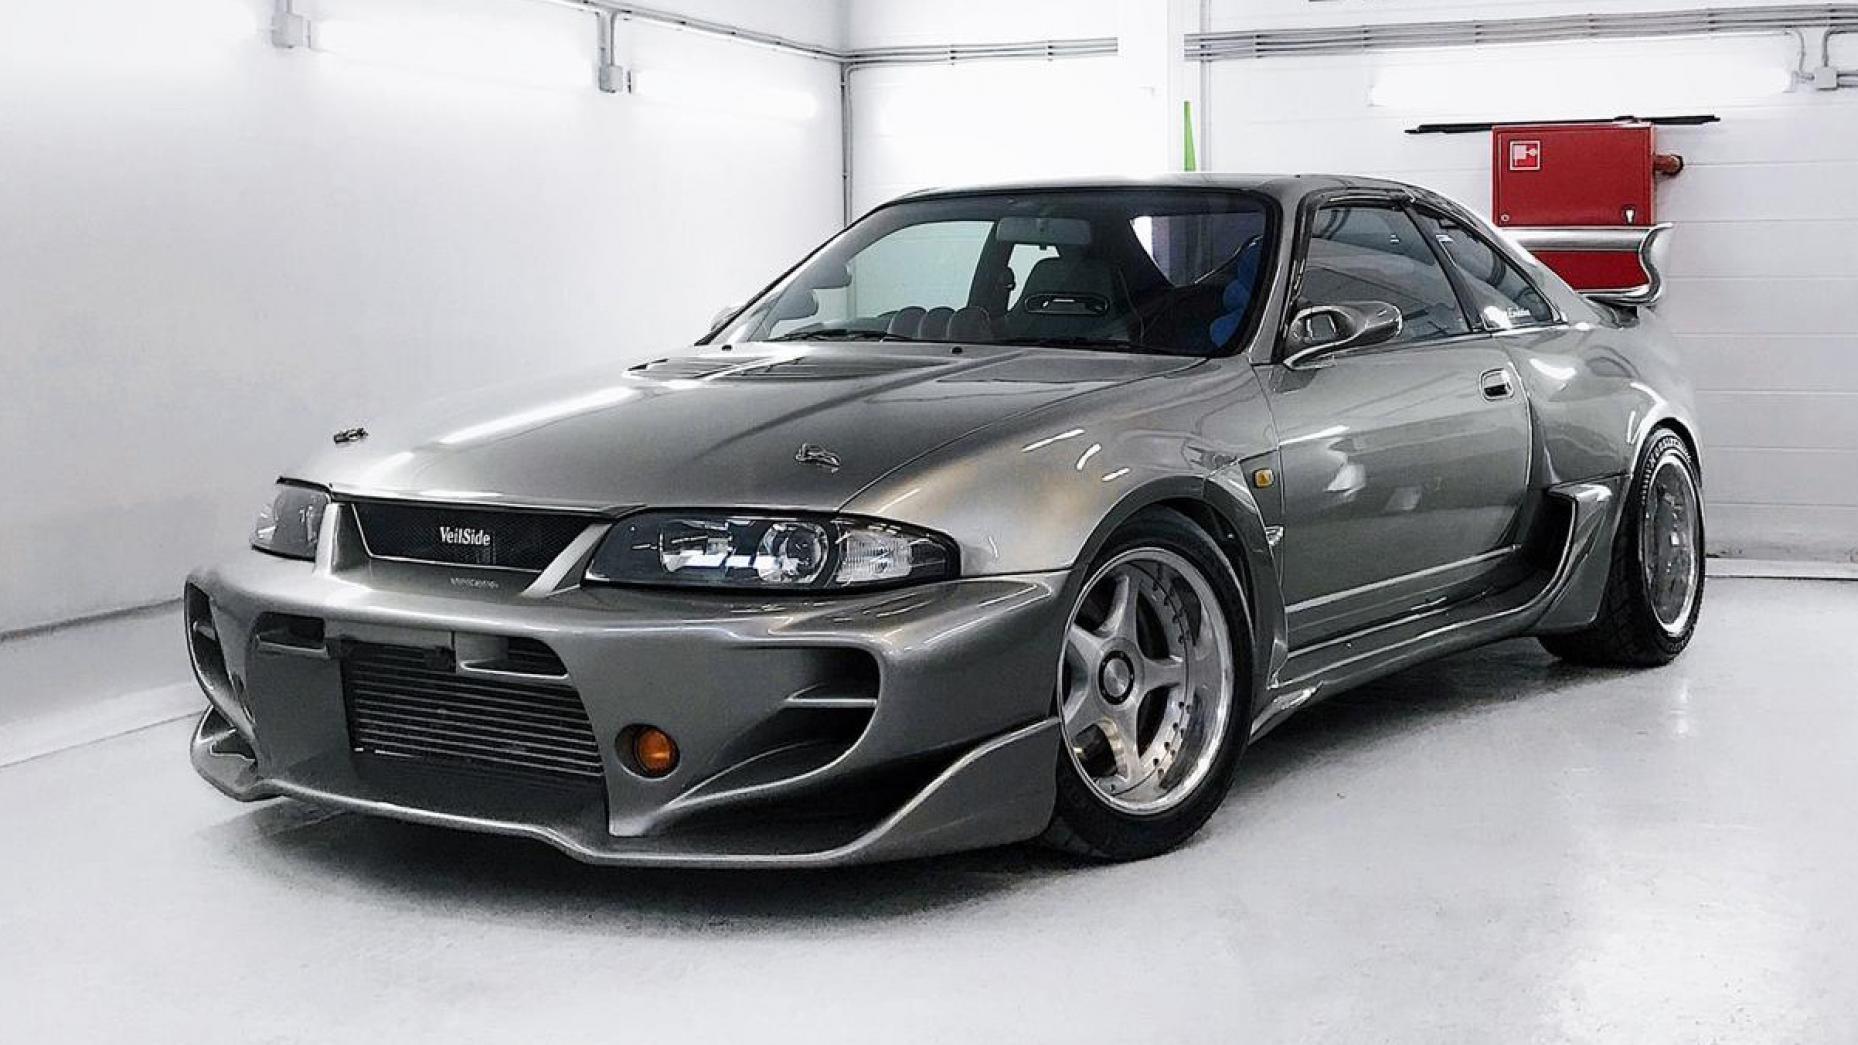 Nissan Skyline R33 GT-R Veilside Combat Evolution